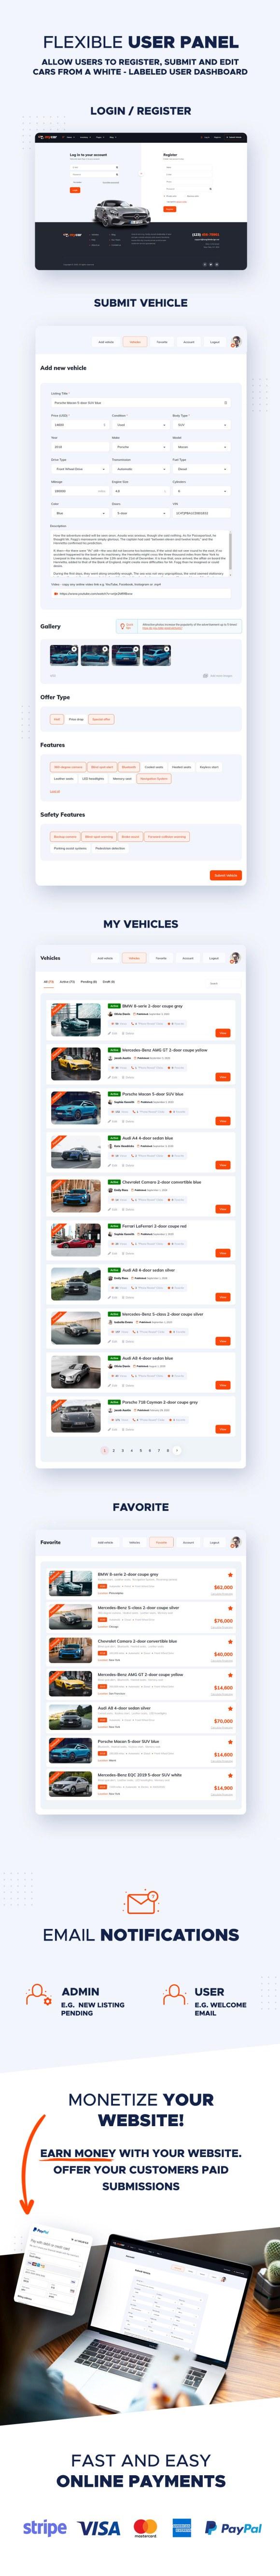 Vehica Directory Listing, Car Dealer - 10